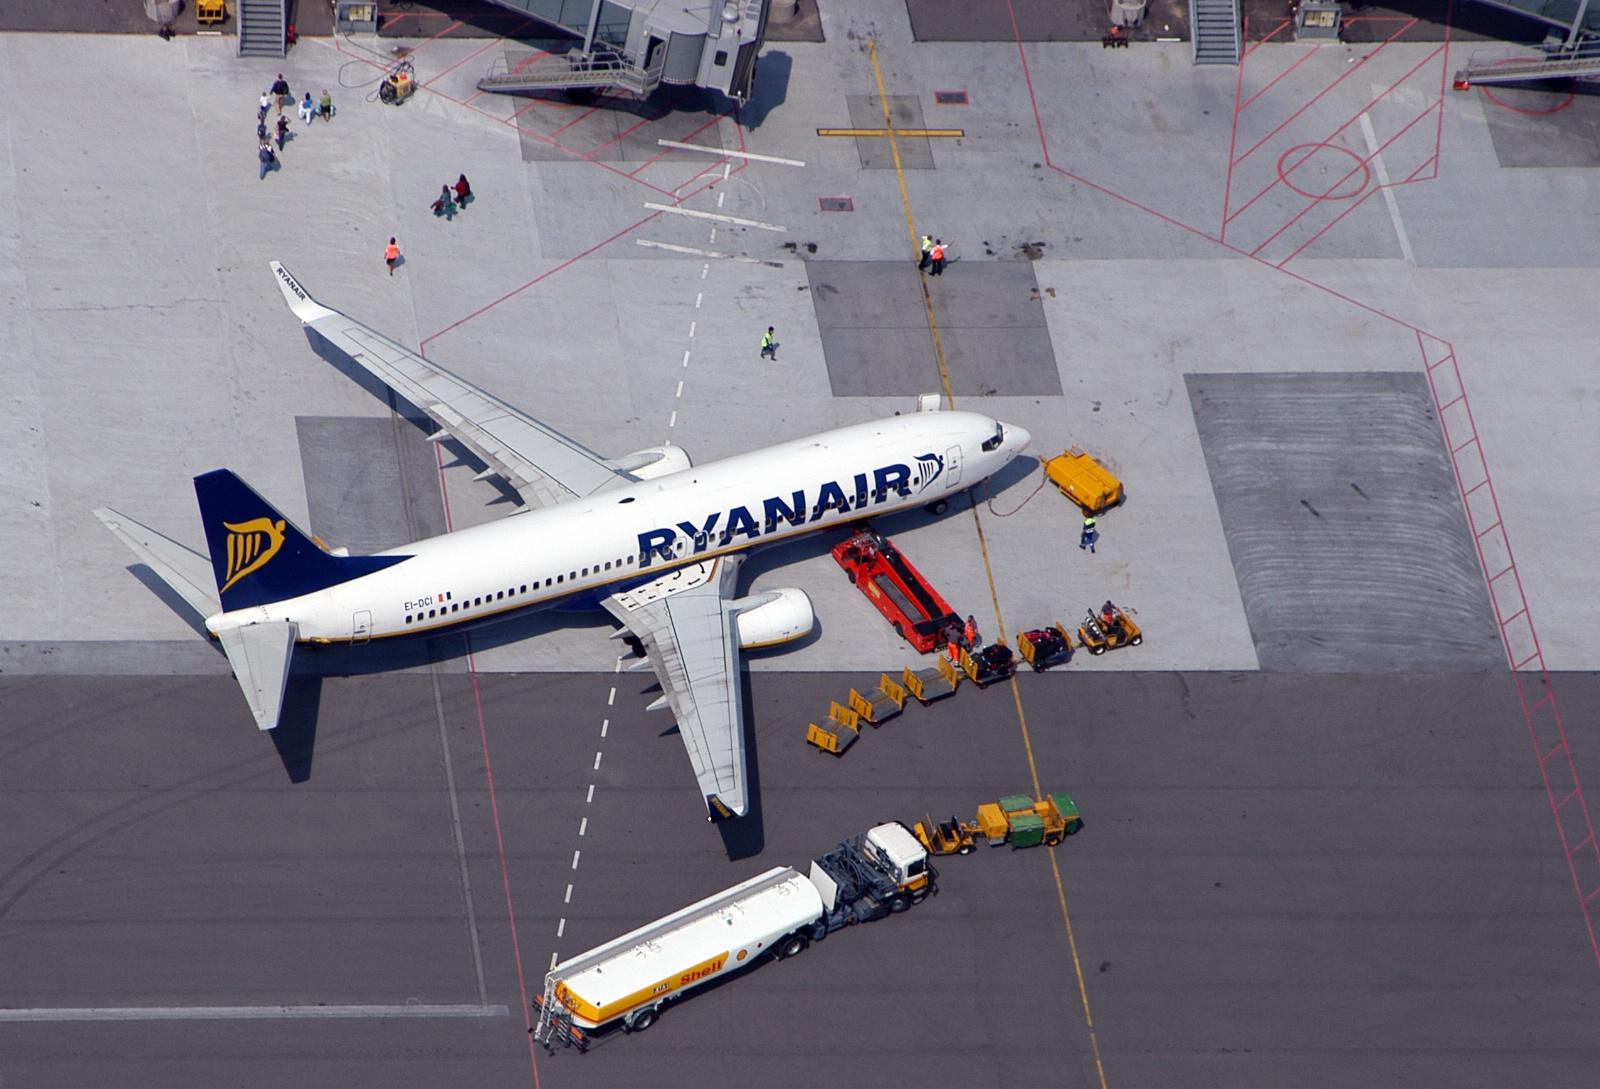 Ryanair-fly på platformen i Billund Lufthavn. (Foto: Billund Lufthavn)